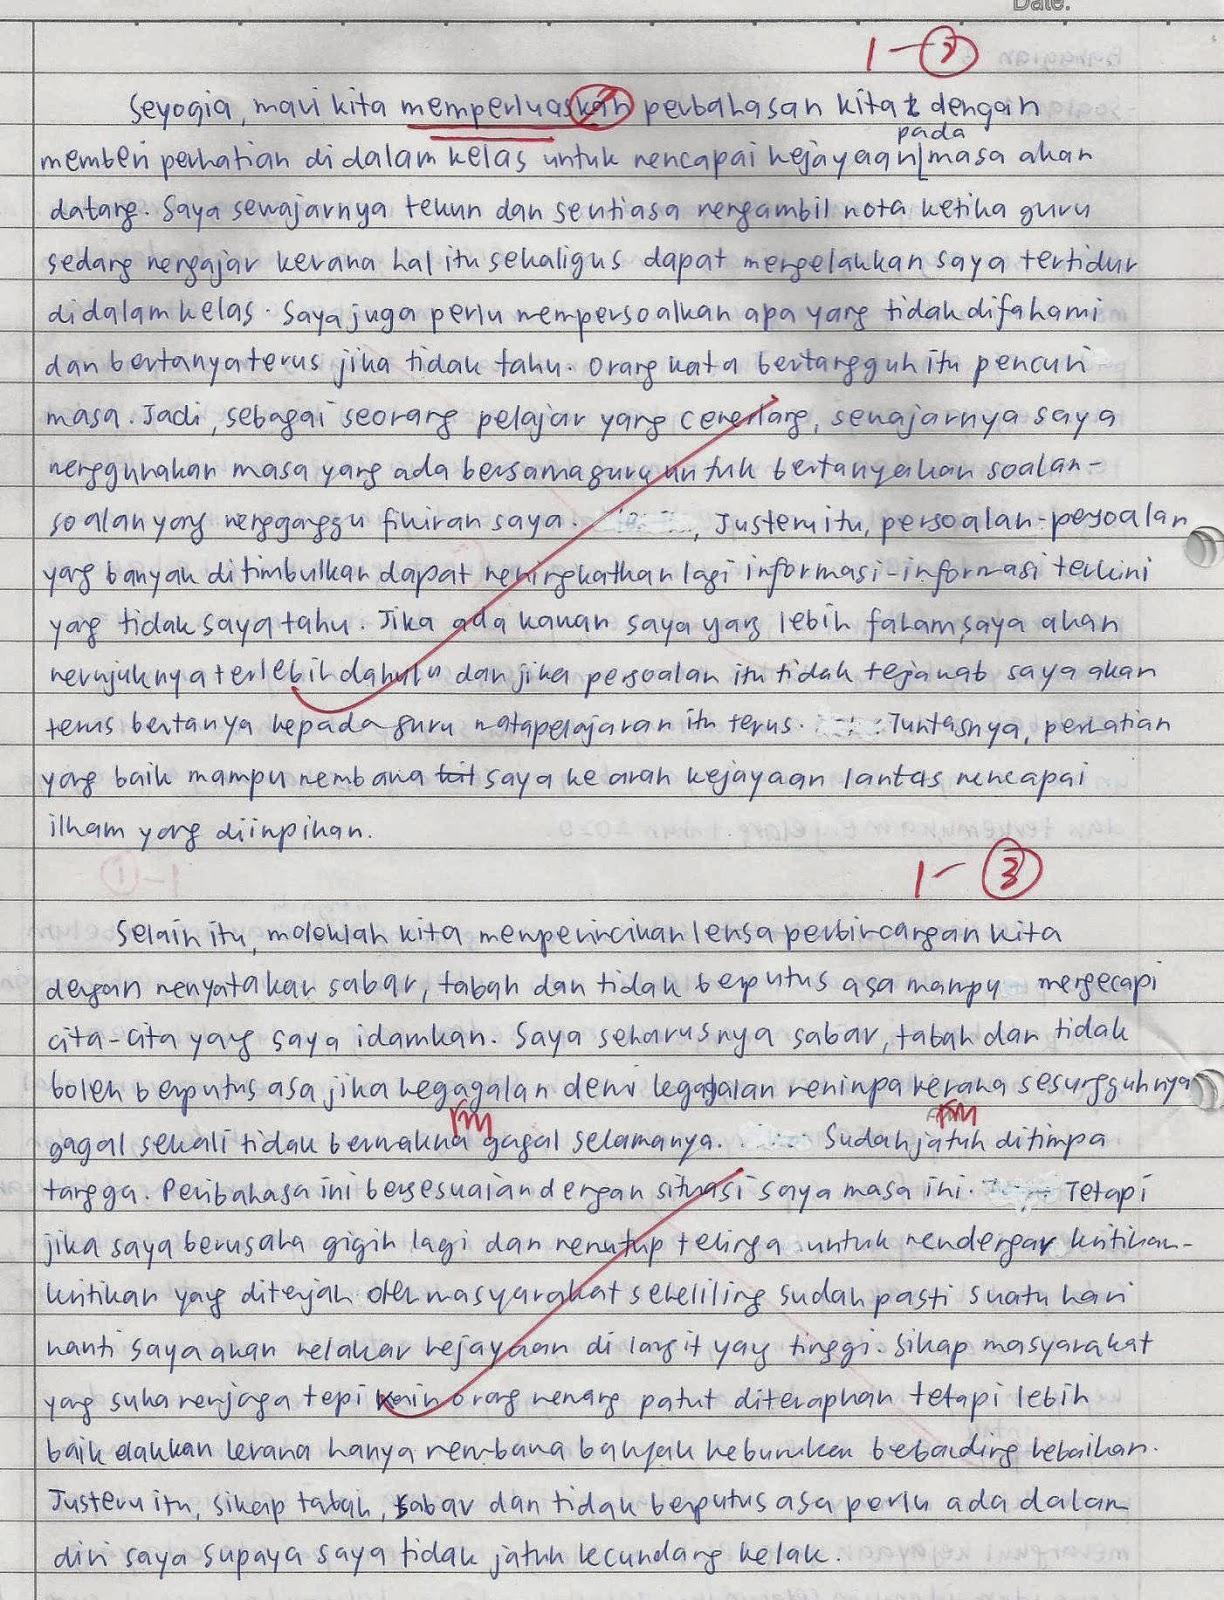 cita tersebut Contoh Karangan Tentang Cita Cita Dalam Bahasa Inggris